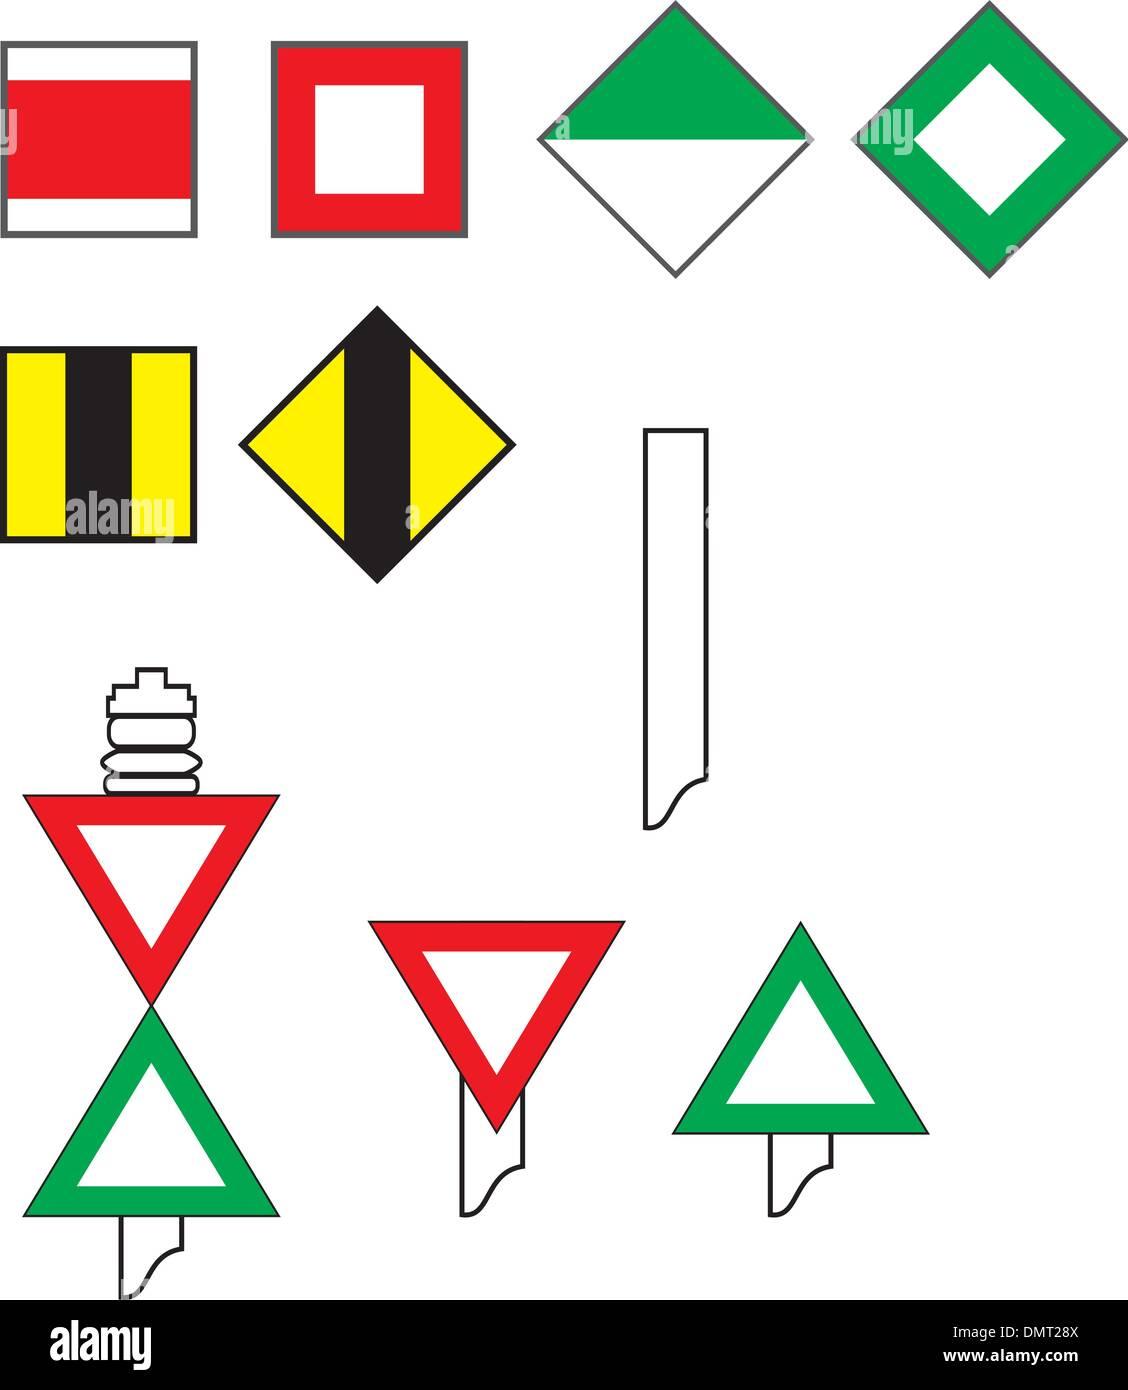 Signs River Navigation - Stock Vector